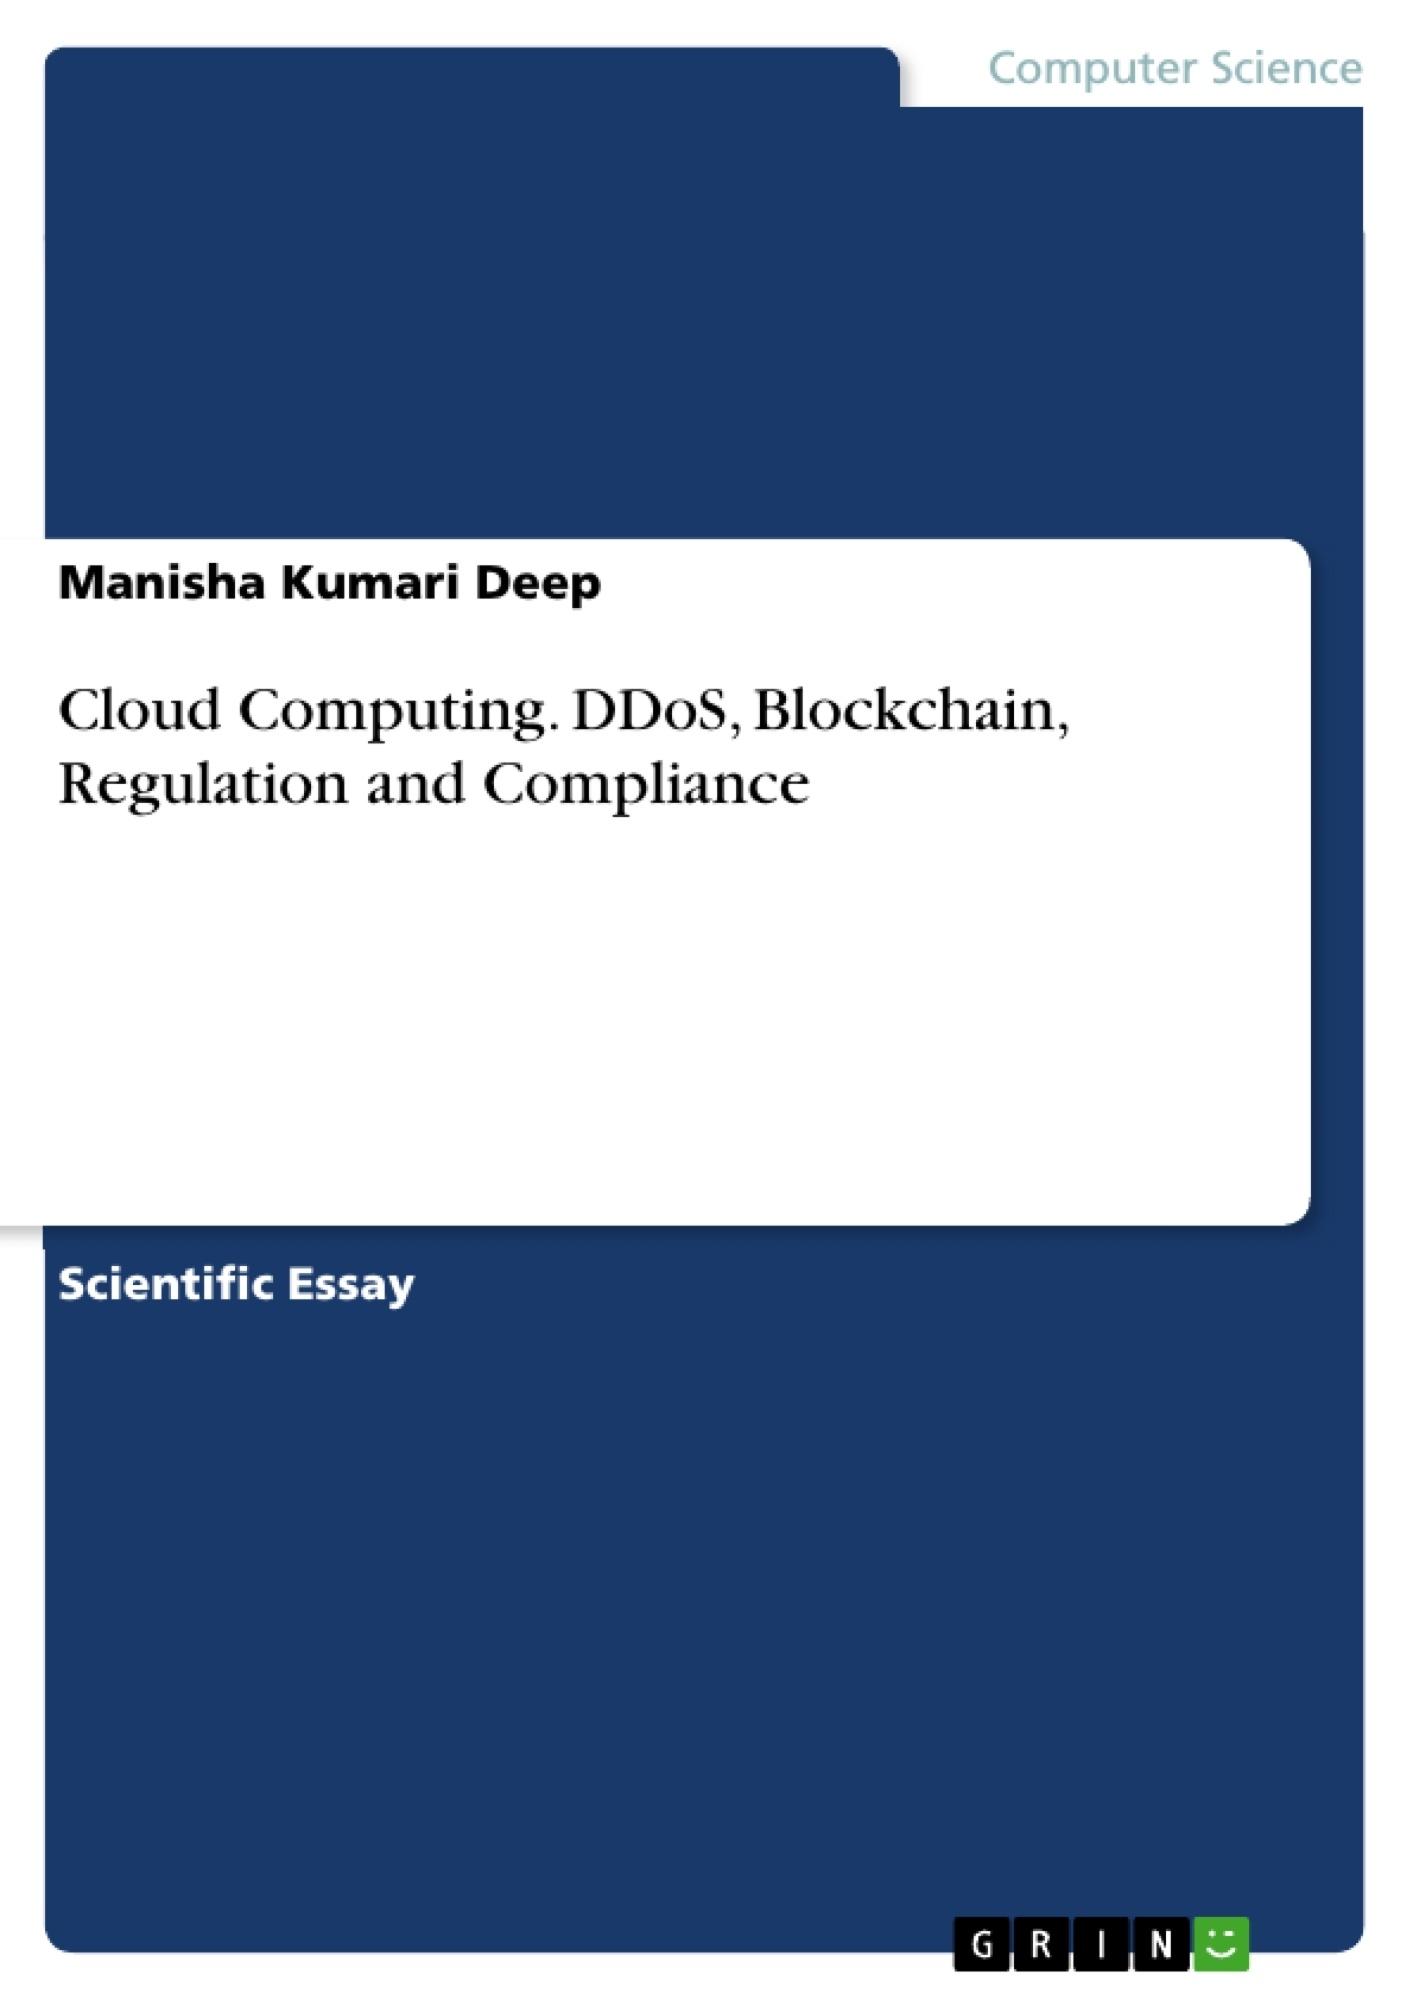 Title: Cloud Computing. DDoS, Blockchain, Regulation and Compliance